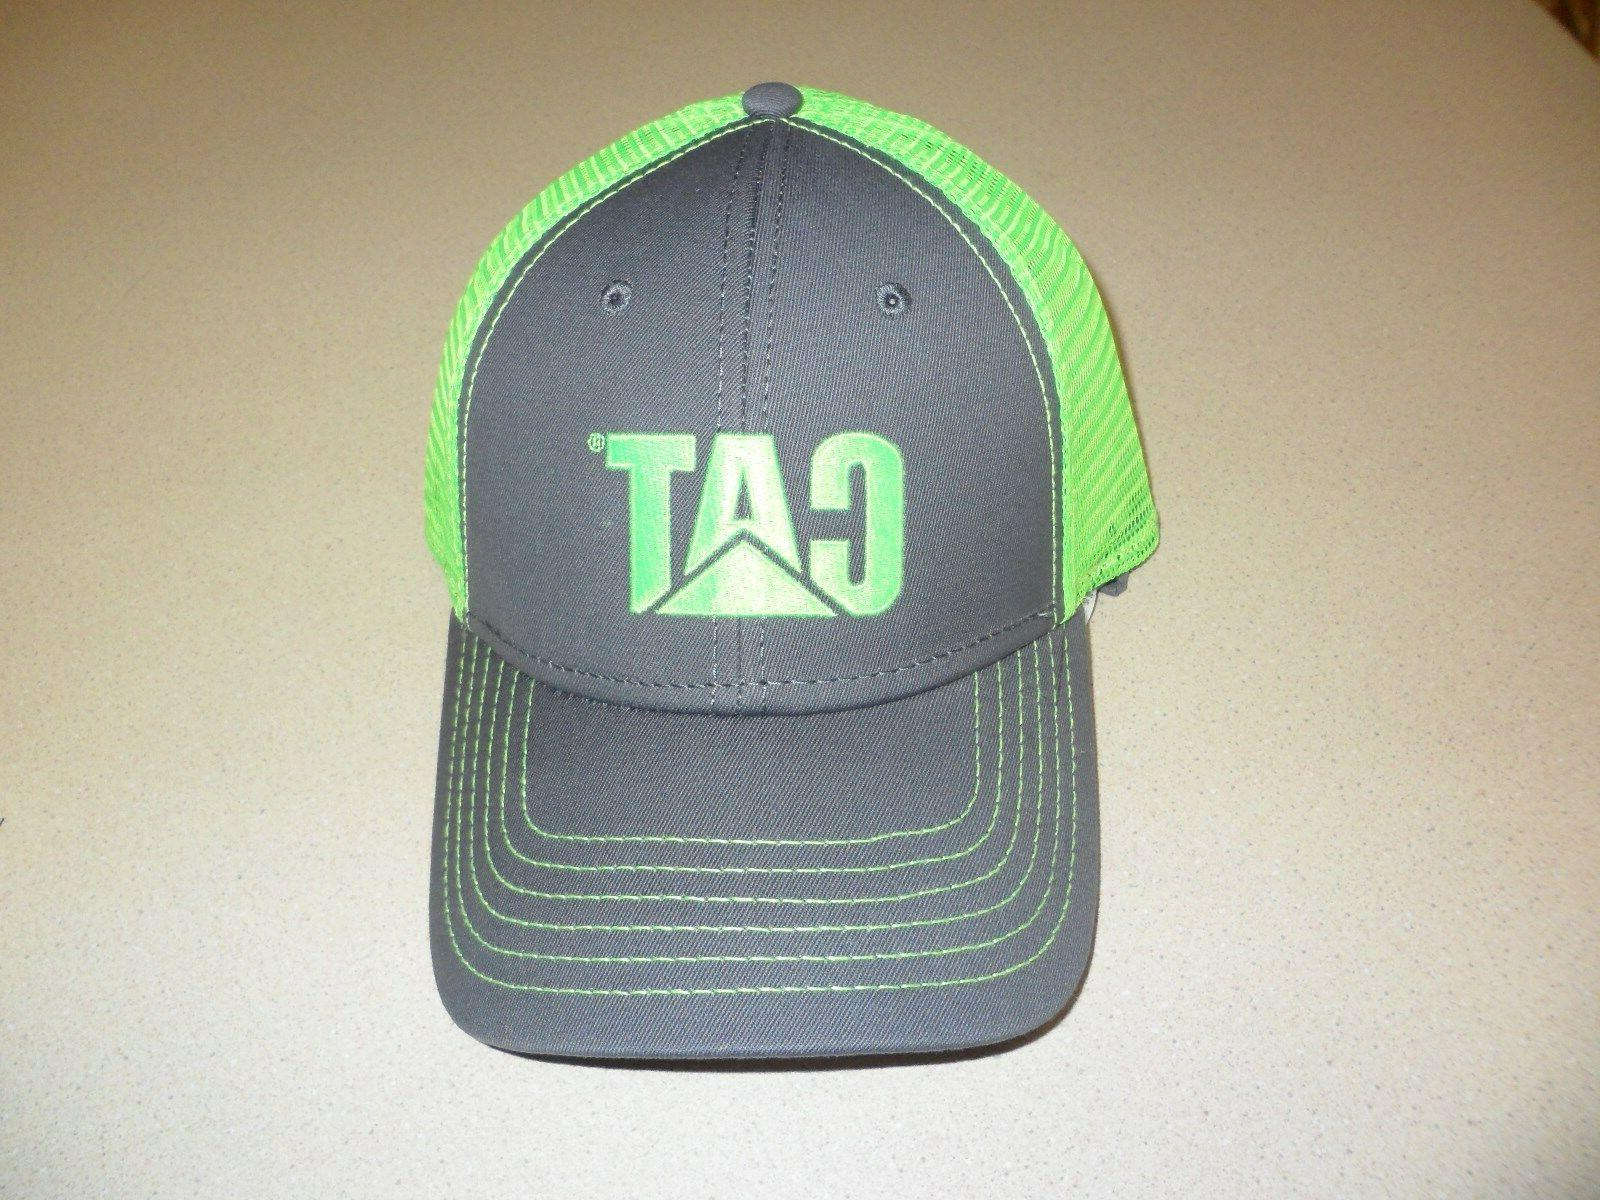 erpillar charcoal hat neon green logo